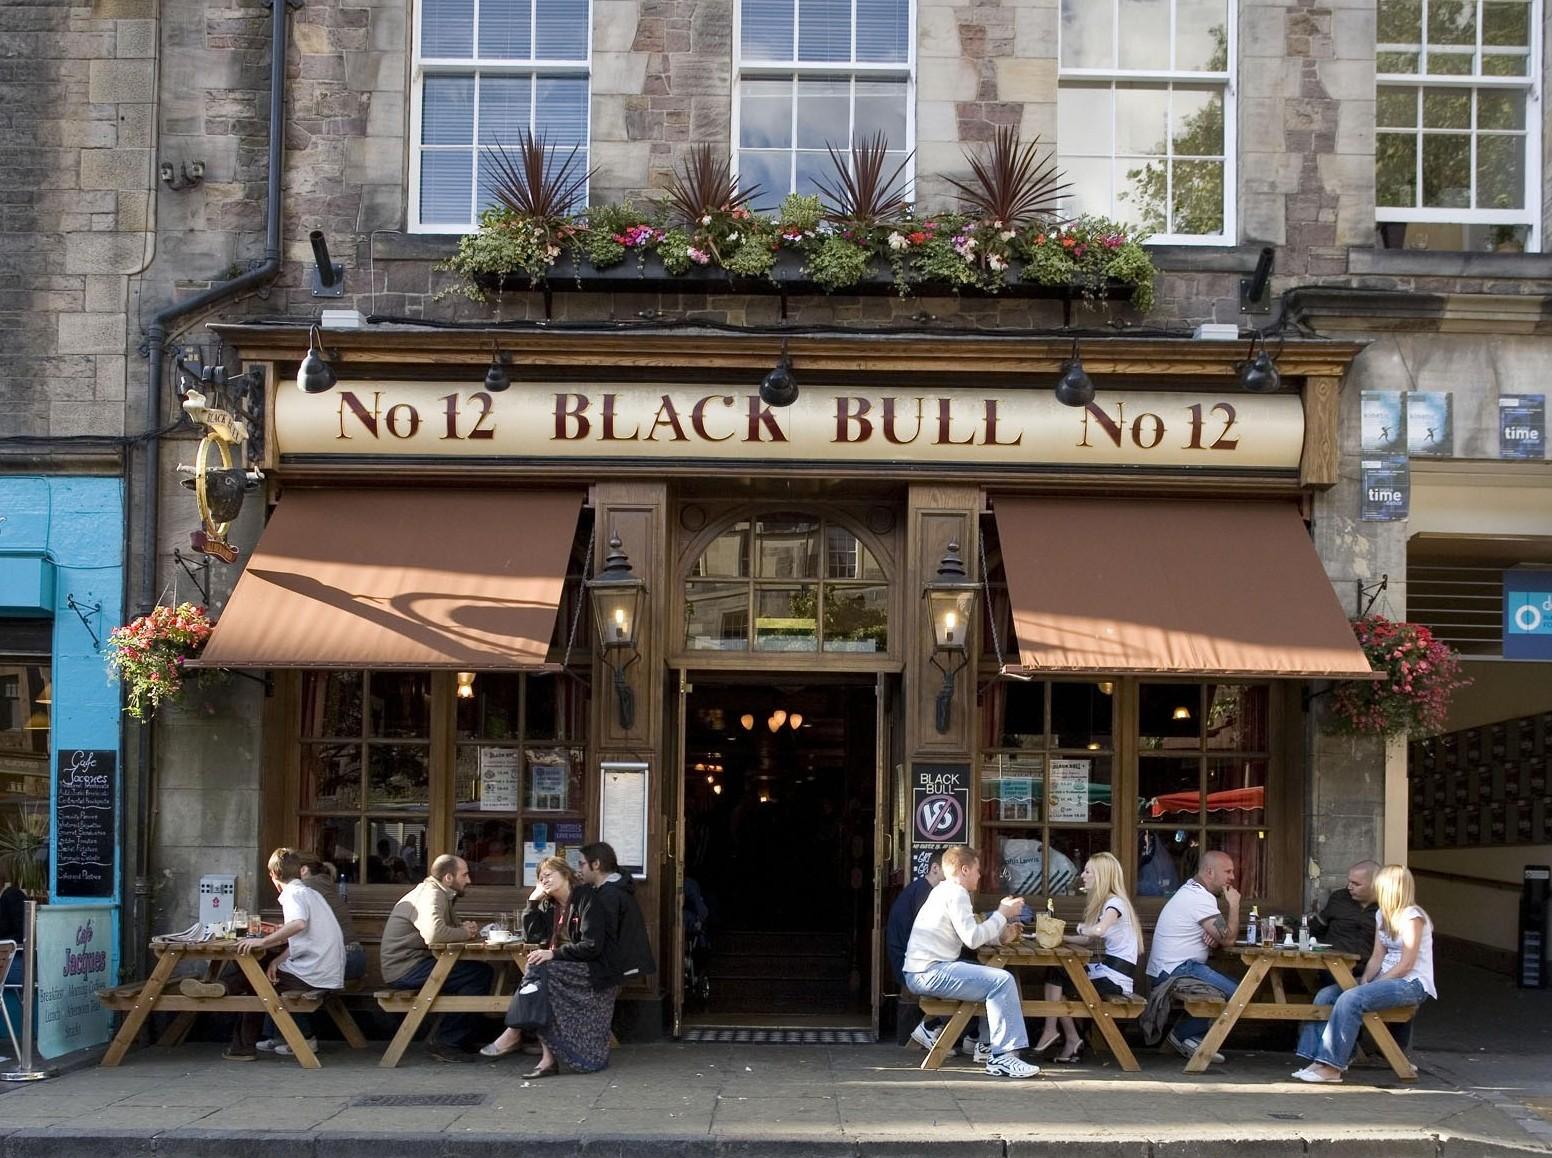 De mooiste Schotse steden - Edinburgh